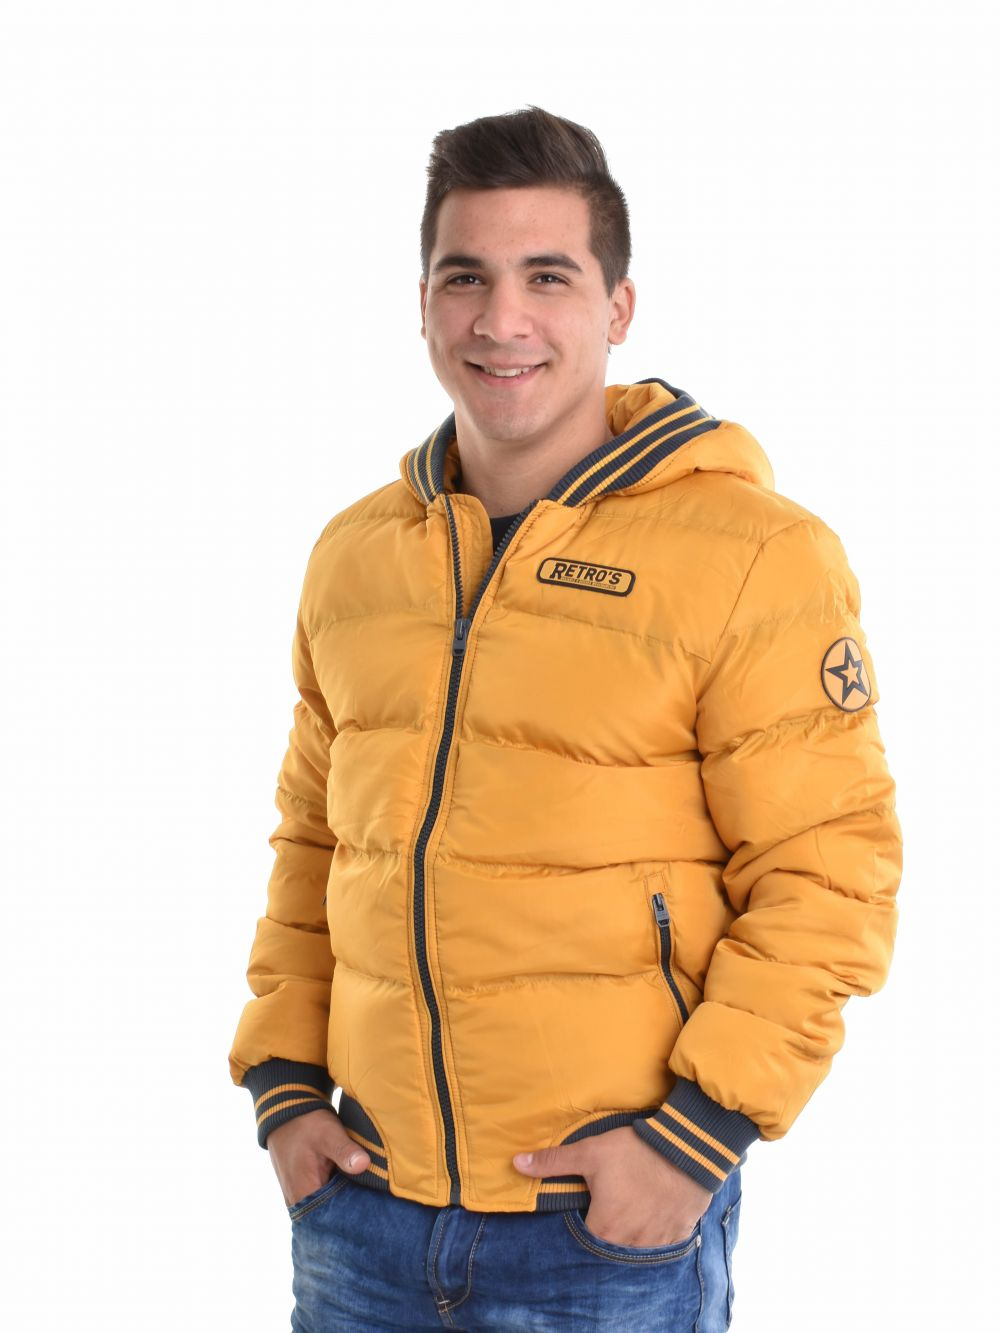 retro jeans férfi kabát